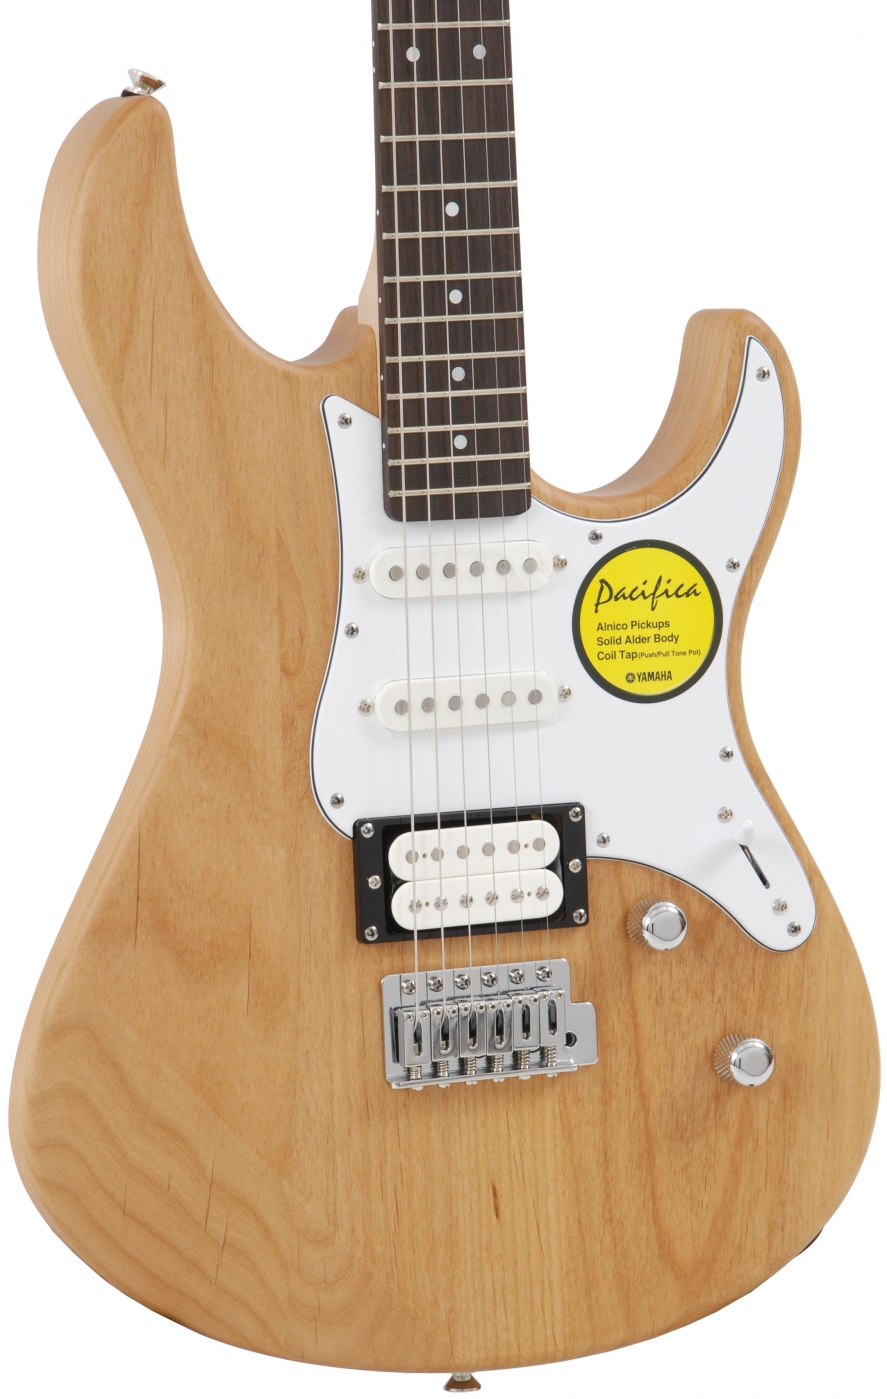 yamaha pacifica 112v yns electric guitar. Black Bedroom Furniture Sets. Home Design Ideas